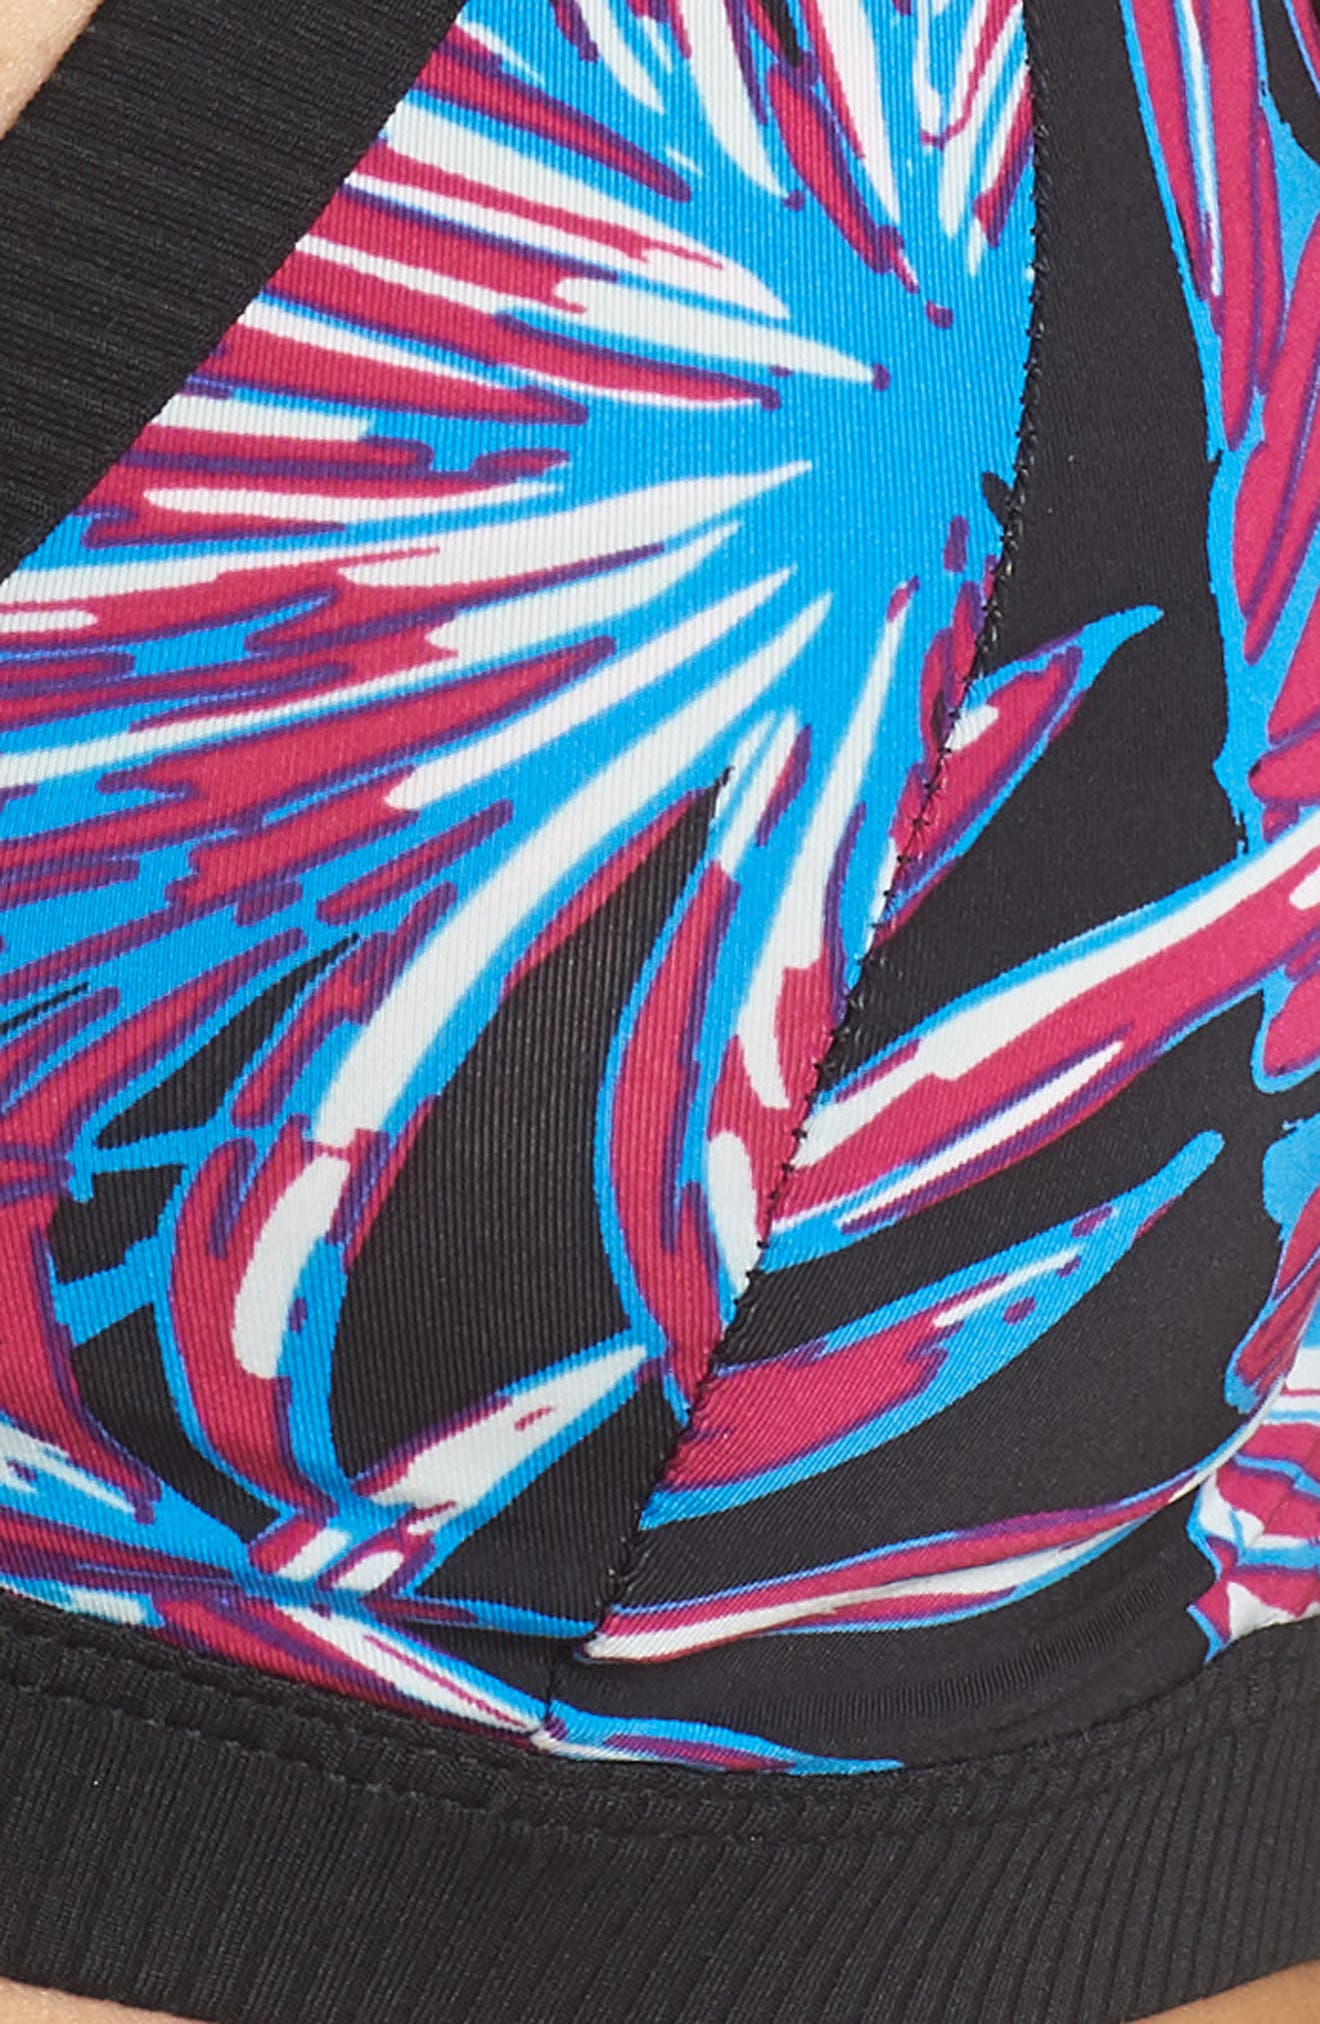 Koko Quick Dry Surf Bikini Top,                             Alternate thumbnail 5, color,                             001